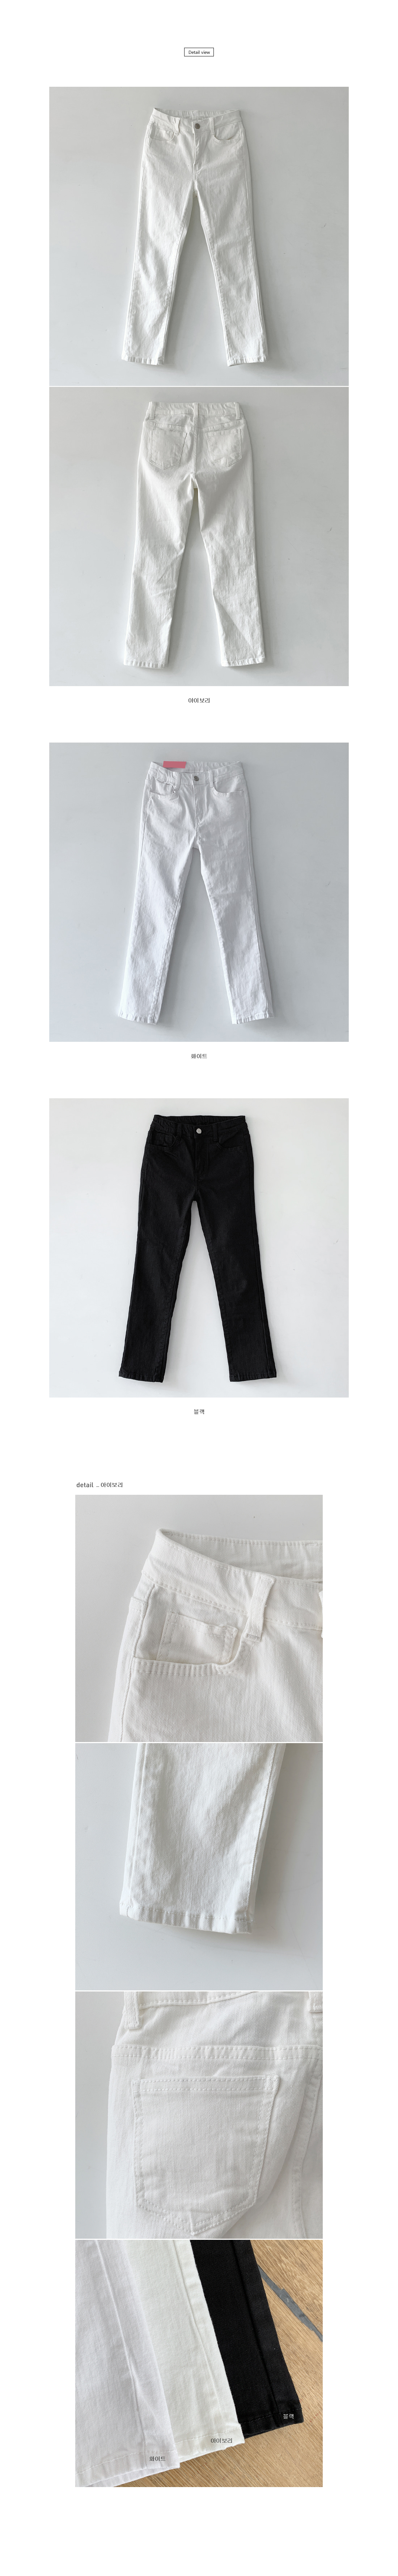 Tiktok 8 Skinny Date Pants